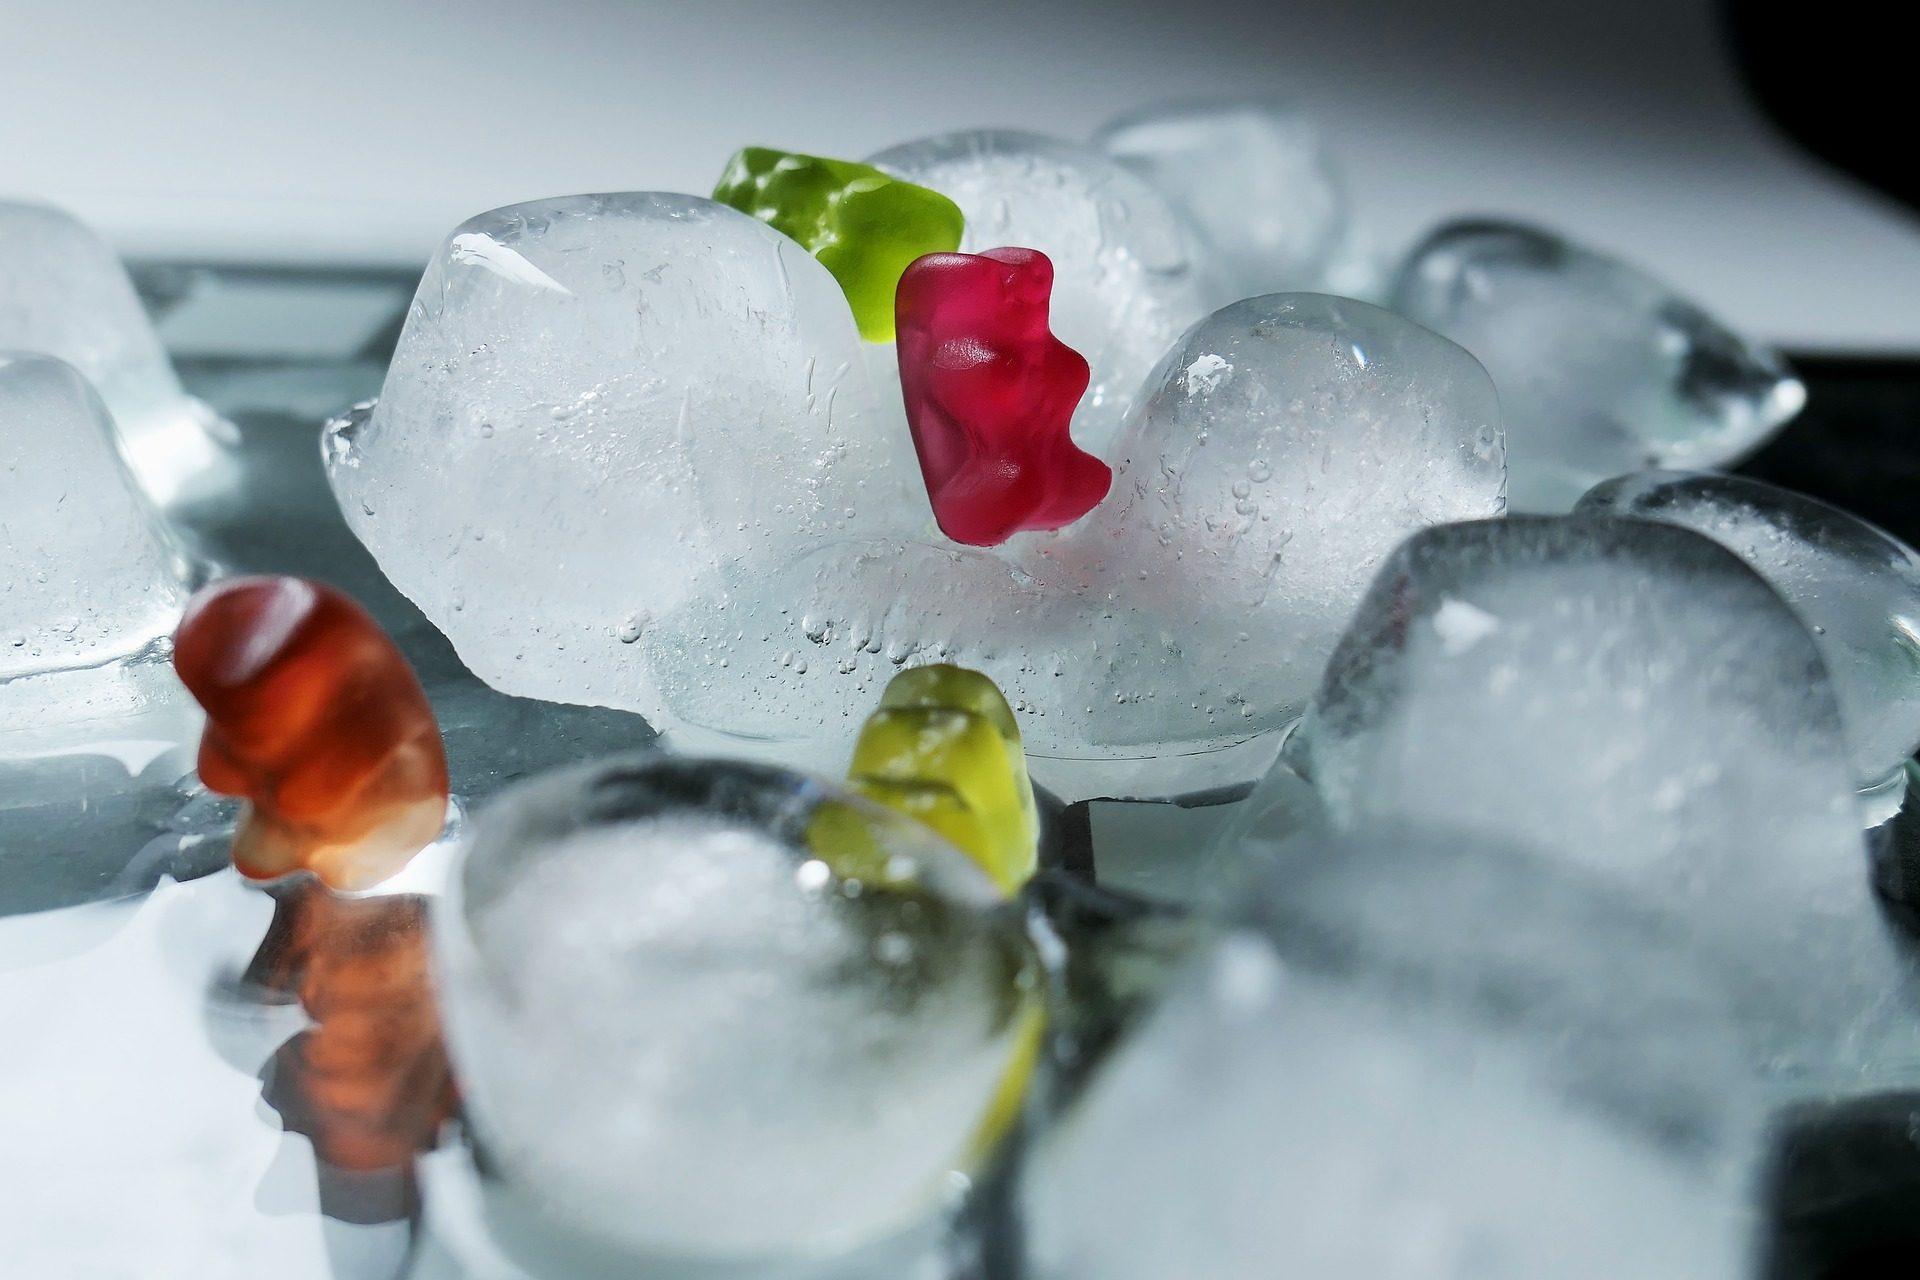 лед, кубики, Плюшевые мишки, gummies, Фенечки - Обои HD - Профессор falken.com